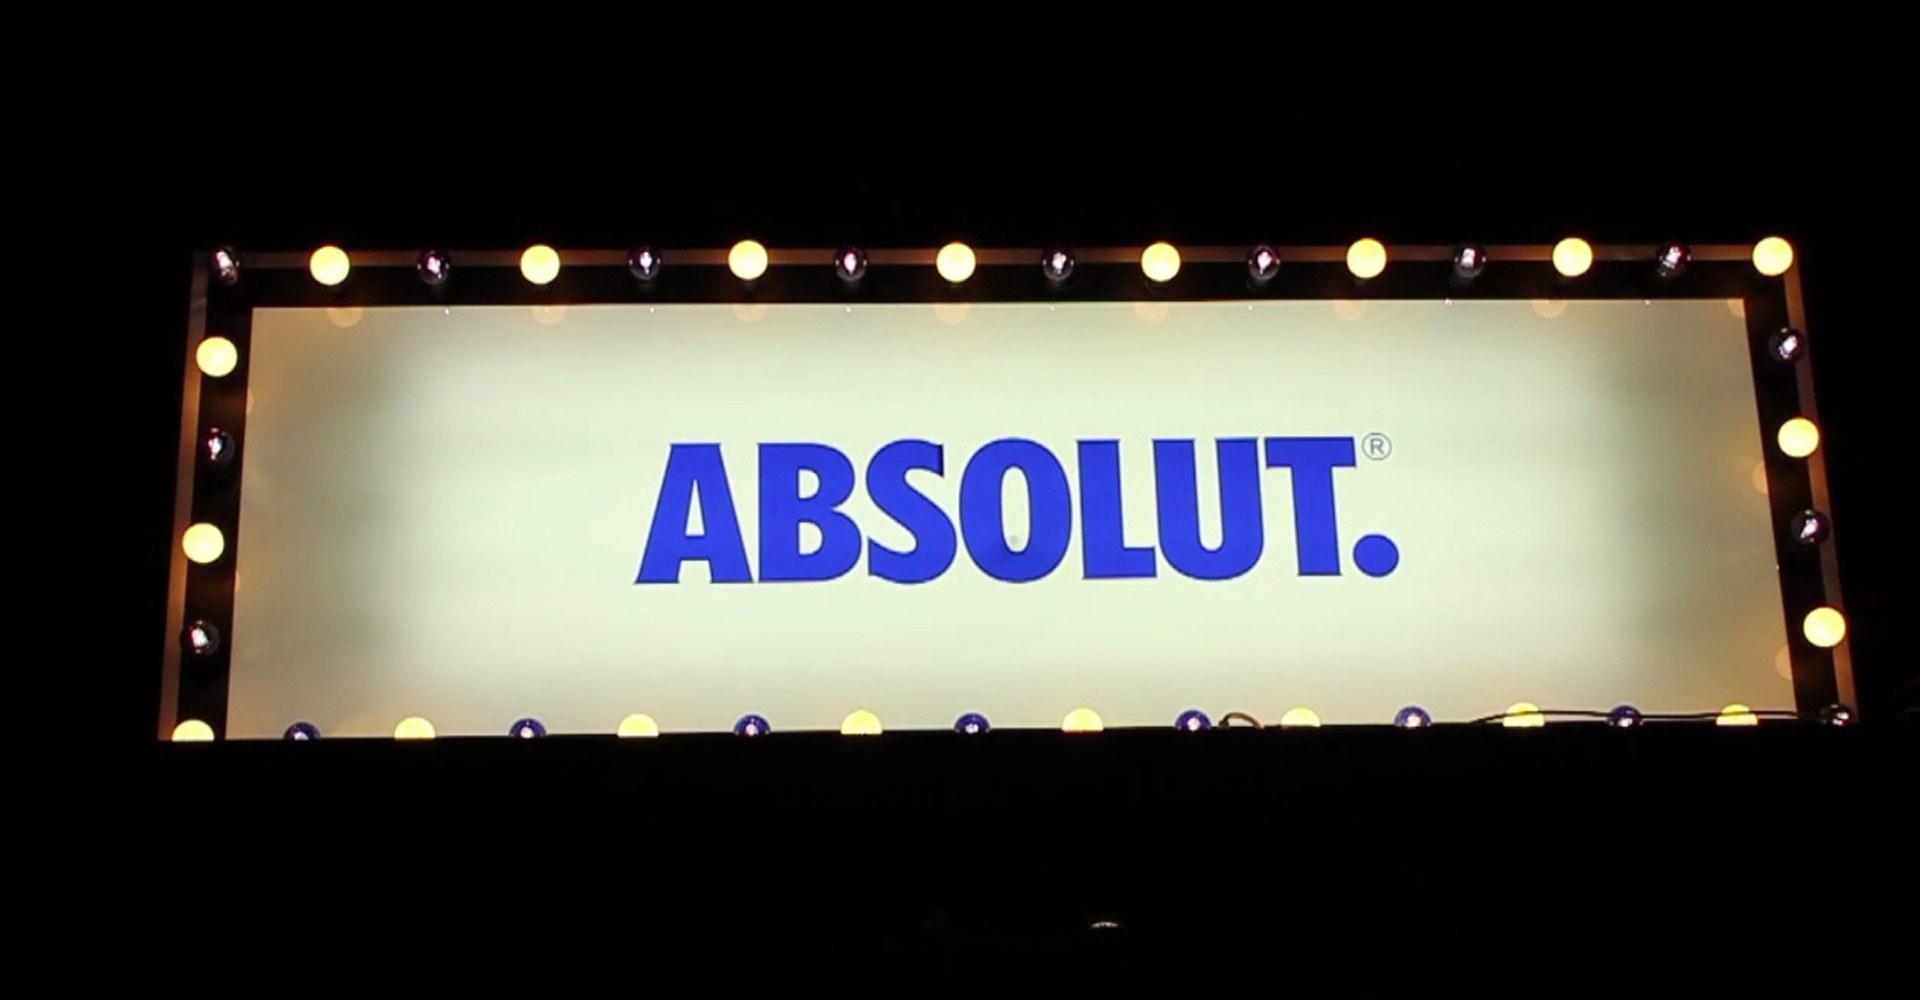 ultravioletto_Club-2-Club-Interactive-Installation-Absolut-Vodka-4